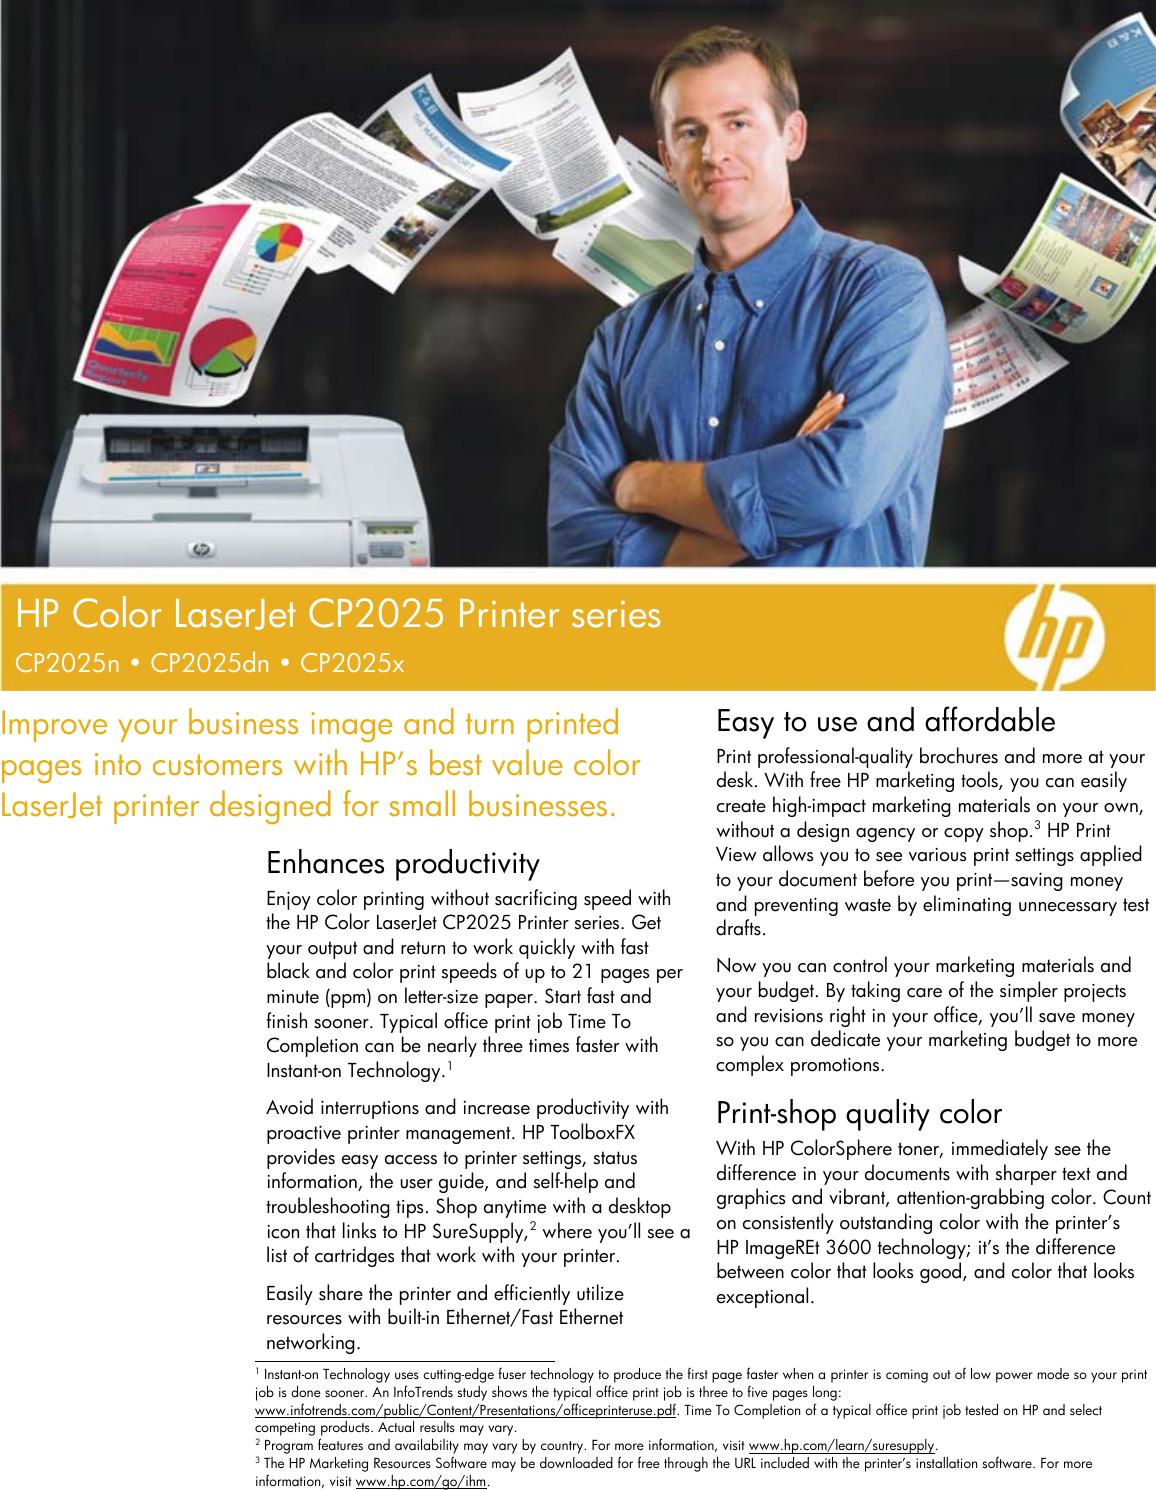 Hp Color Laserjet Cp2025N Users Manual